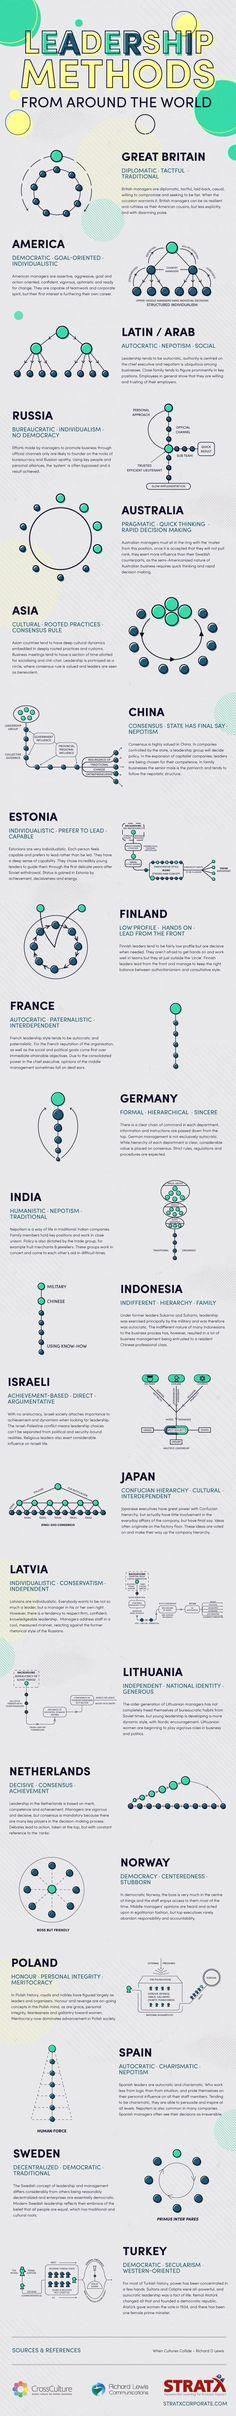 Leadership Methods from Around the World #Infographic (scheduled via http://www.tailwindapp.com?utm_source=pinterest&utm_medium=twpin&utm_content=post102153749&utm_campaign=scheduler_attribution)